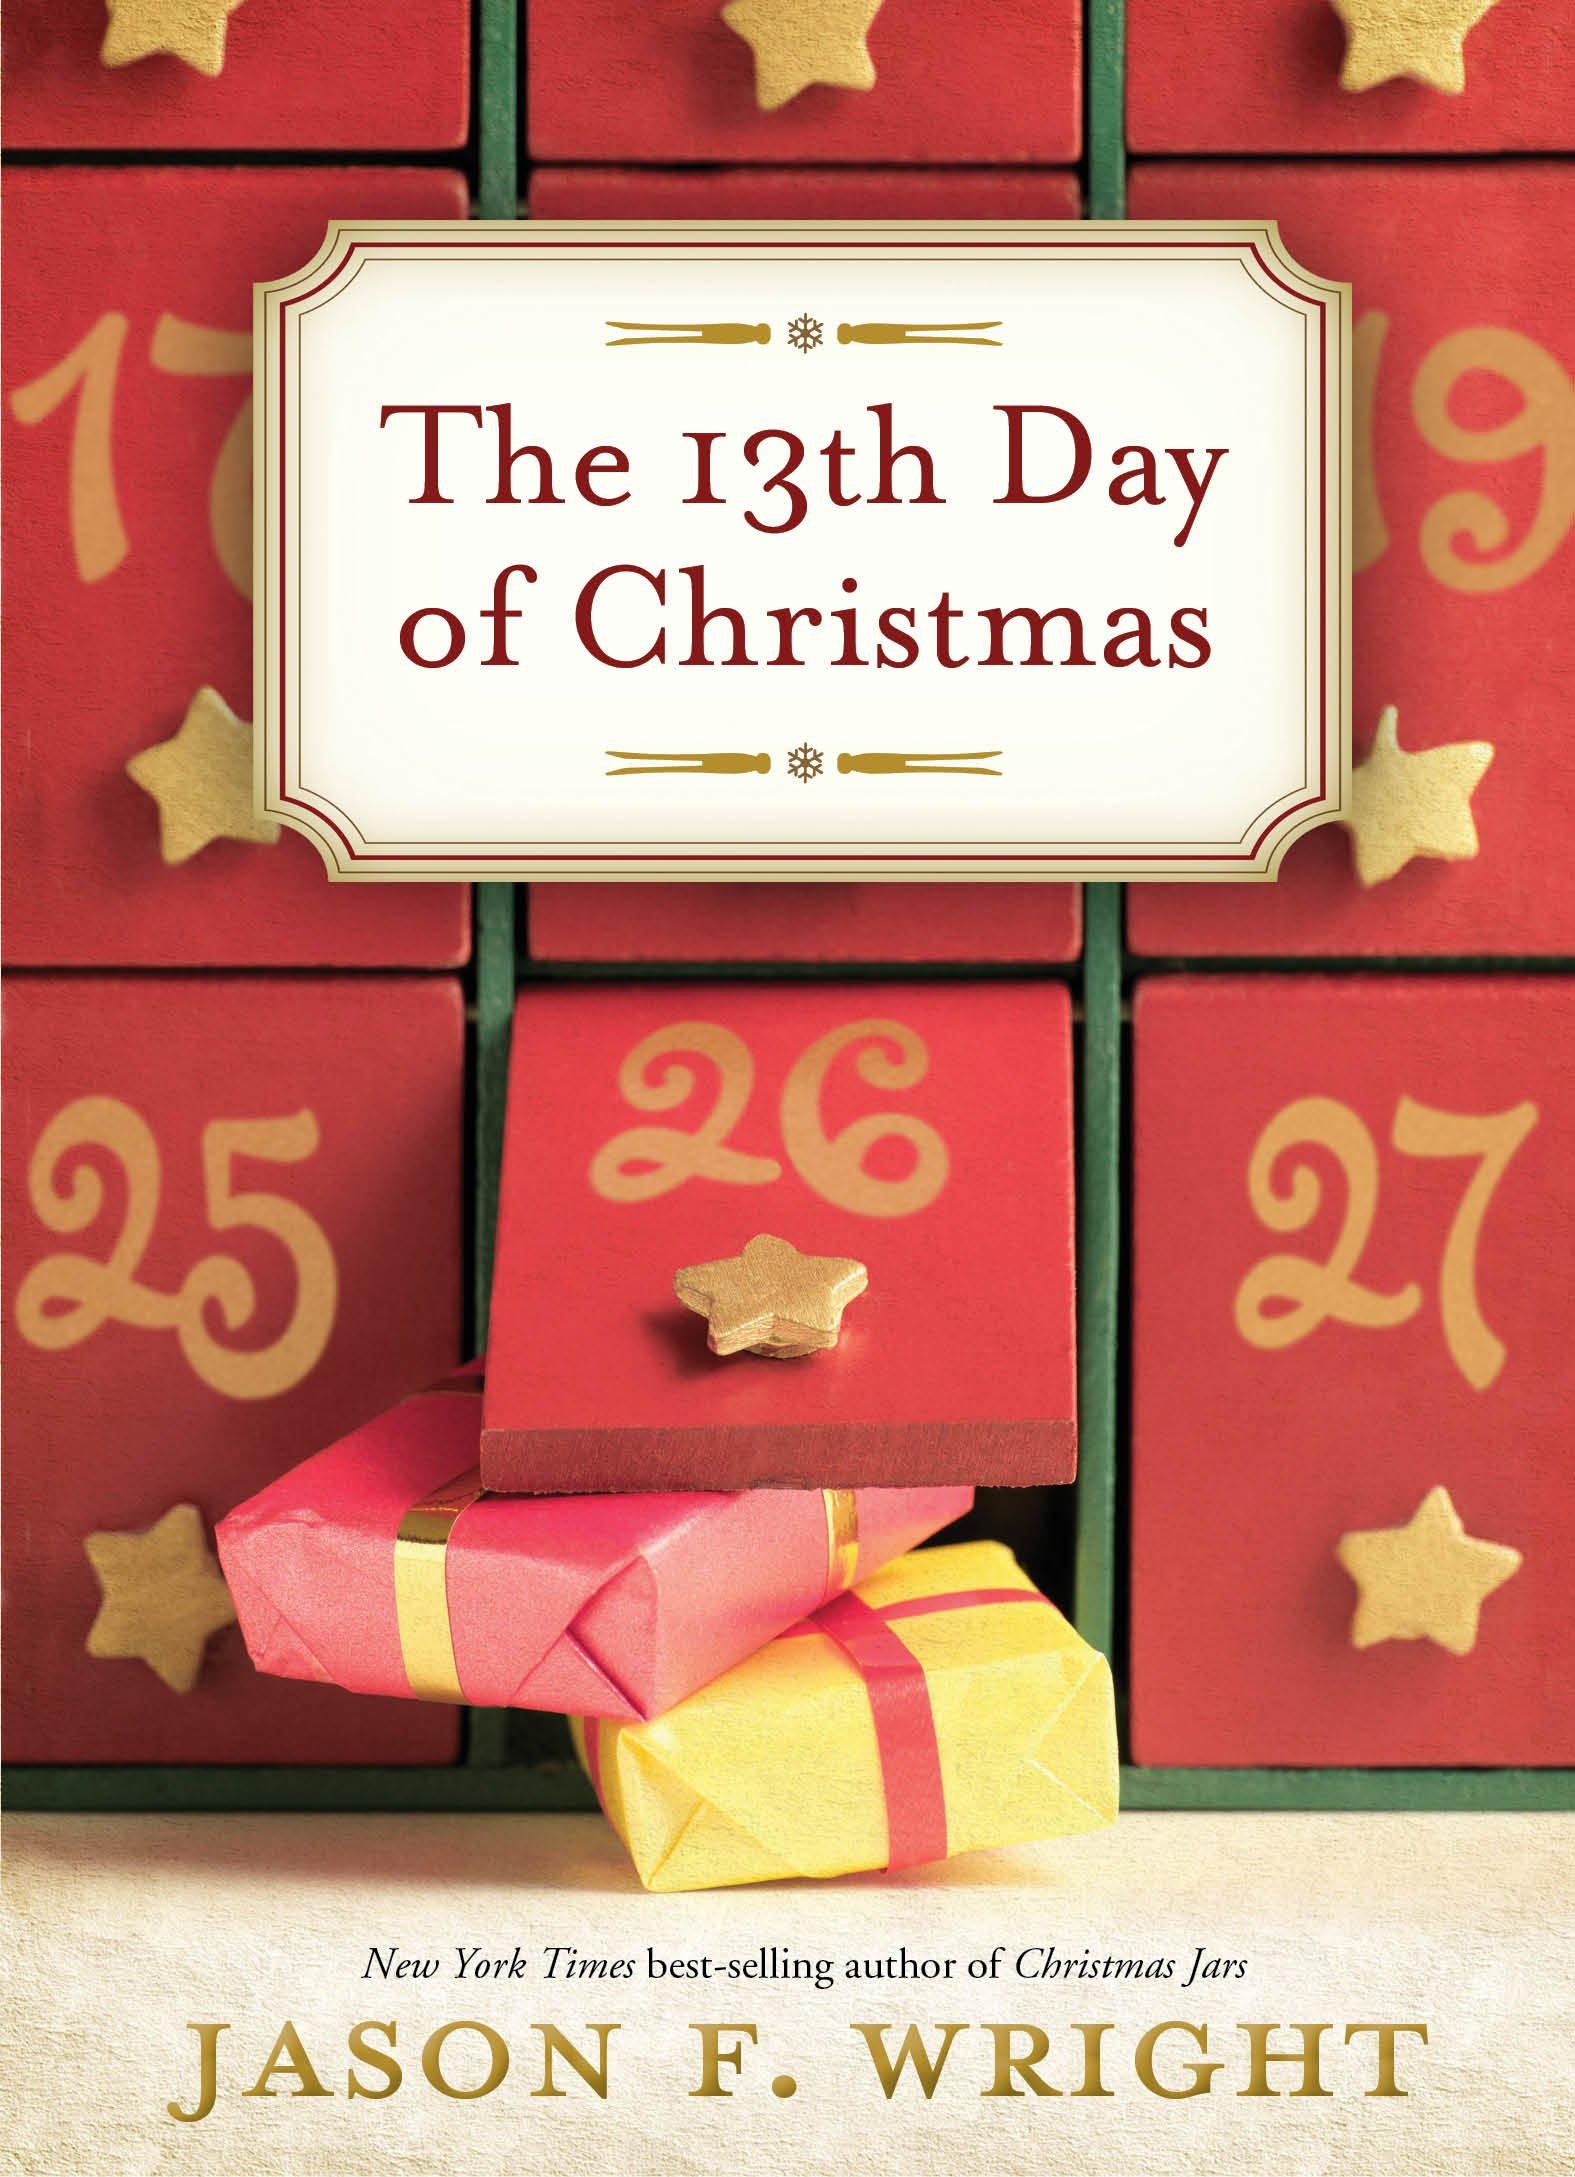 Amazon.com: The 13th Day of Christmas (9781609079277): Jason F ...